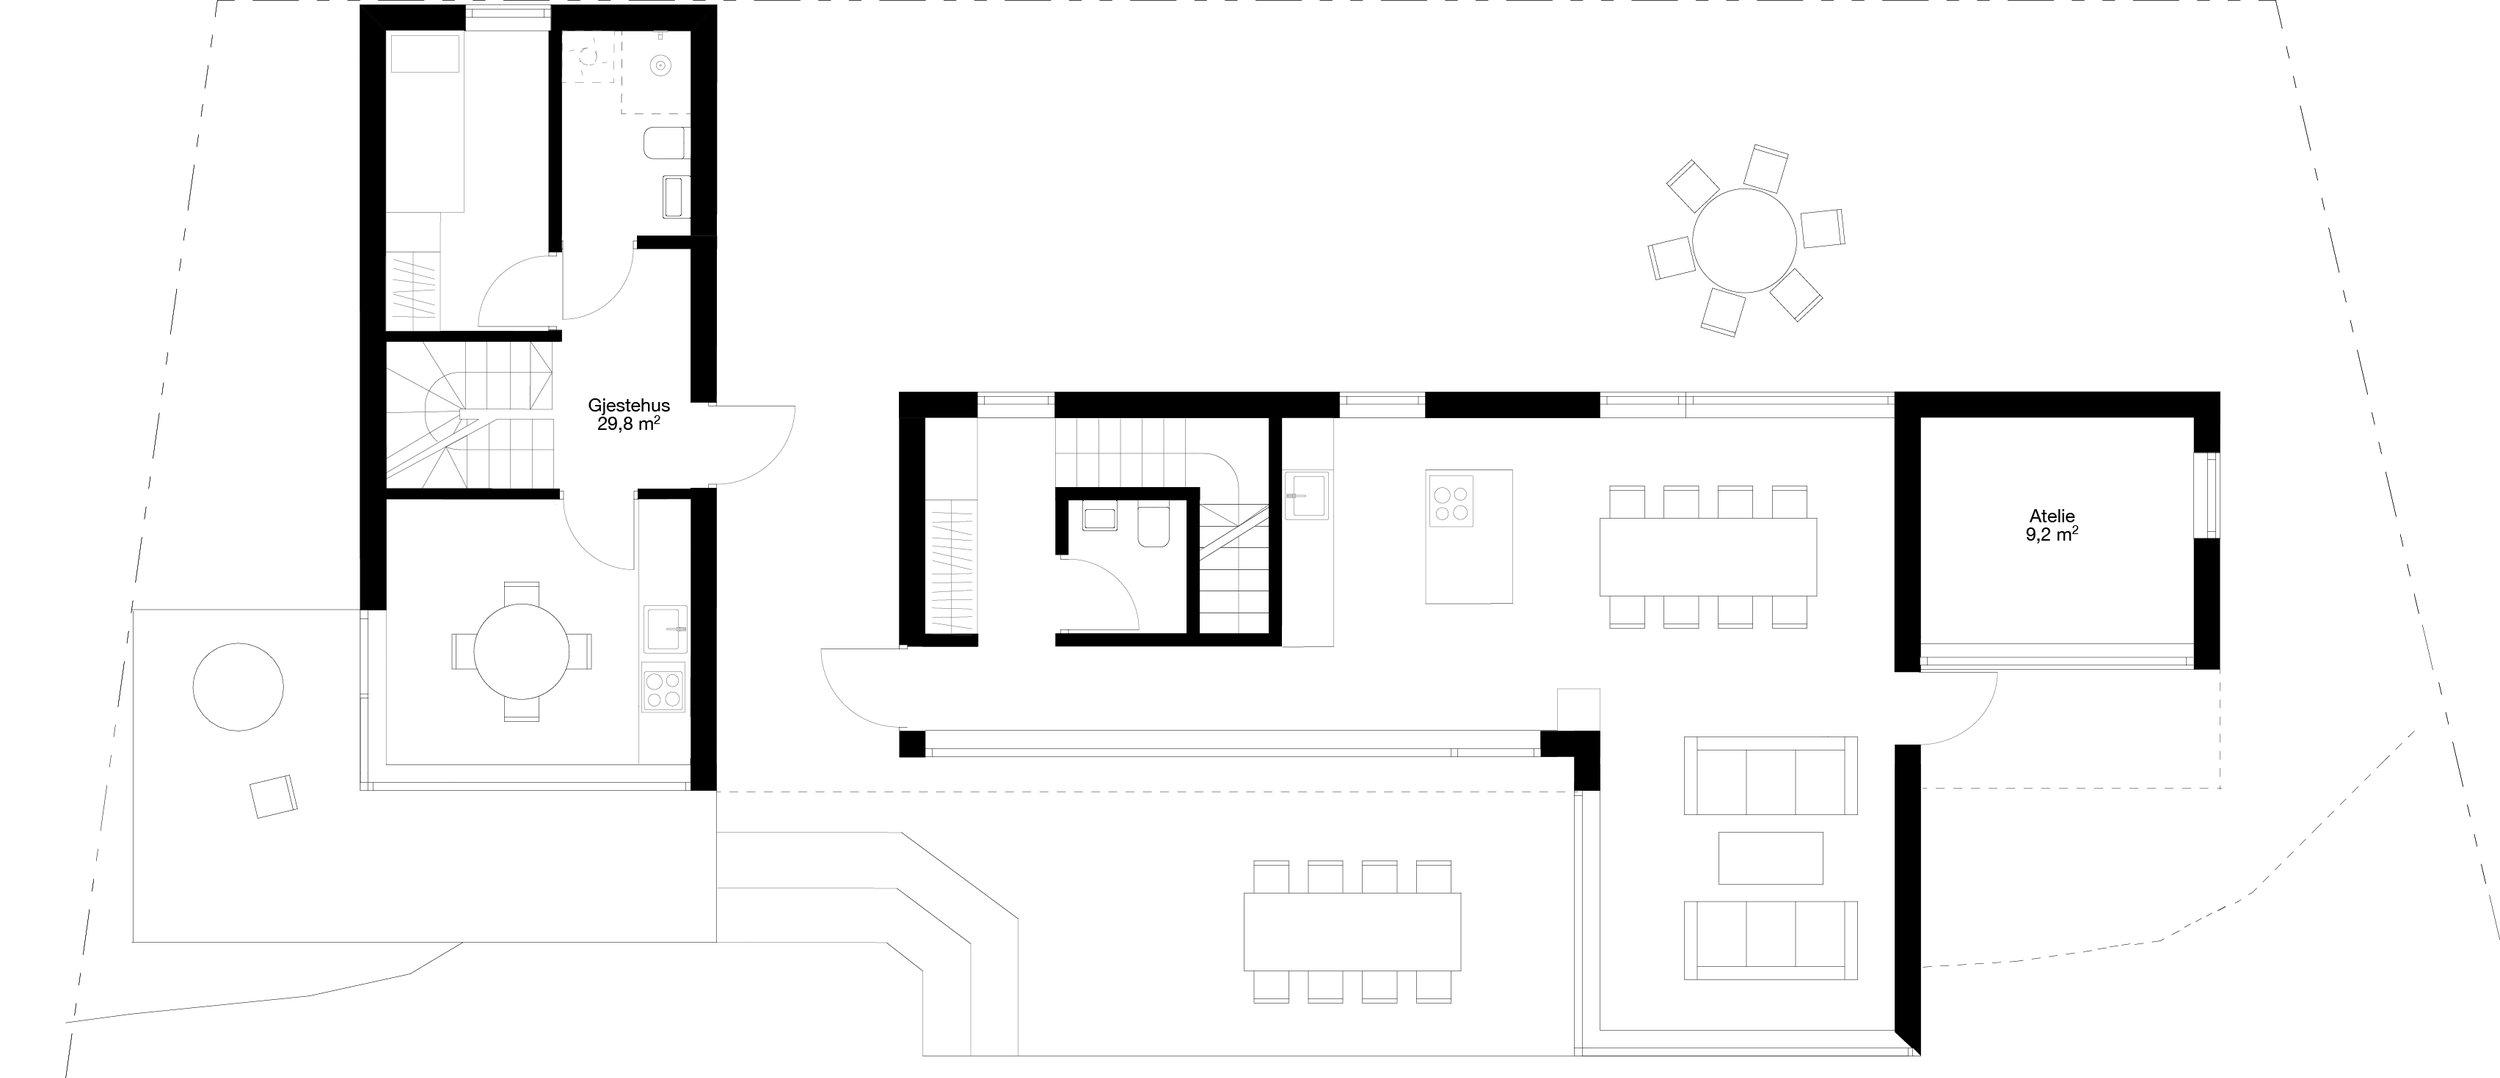 plan 1.jpg